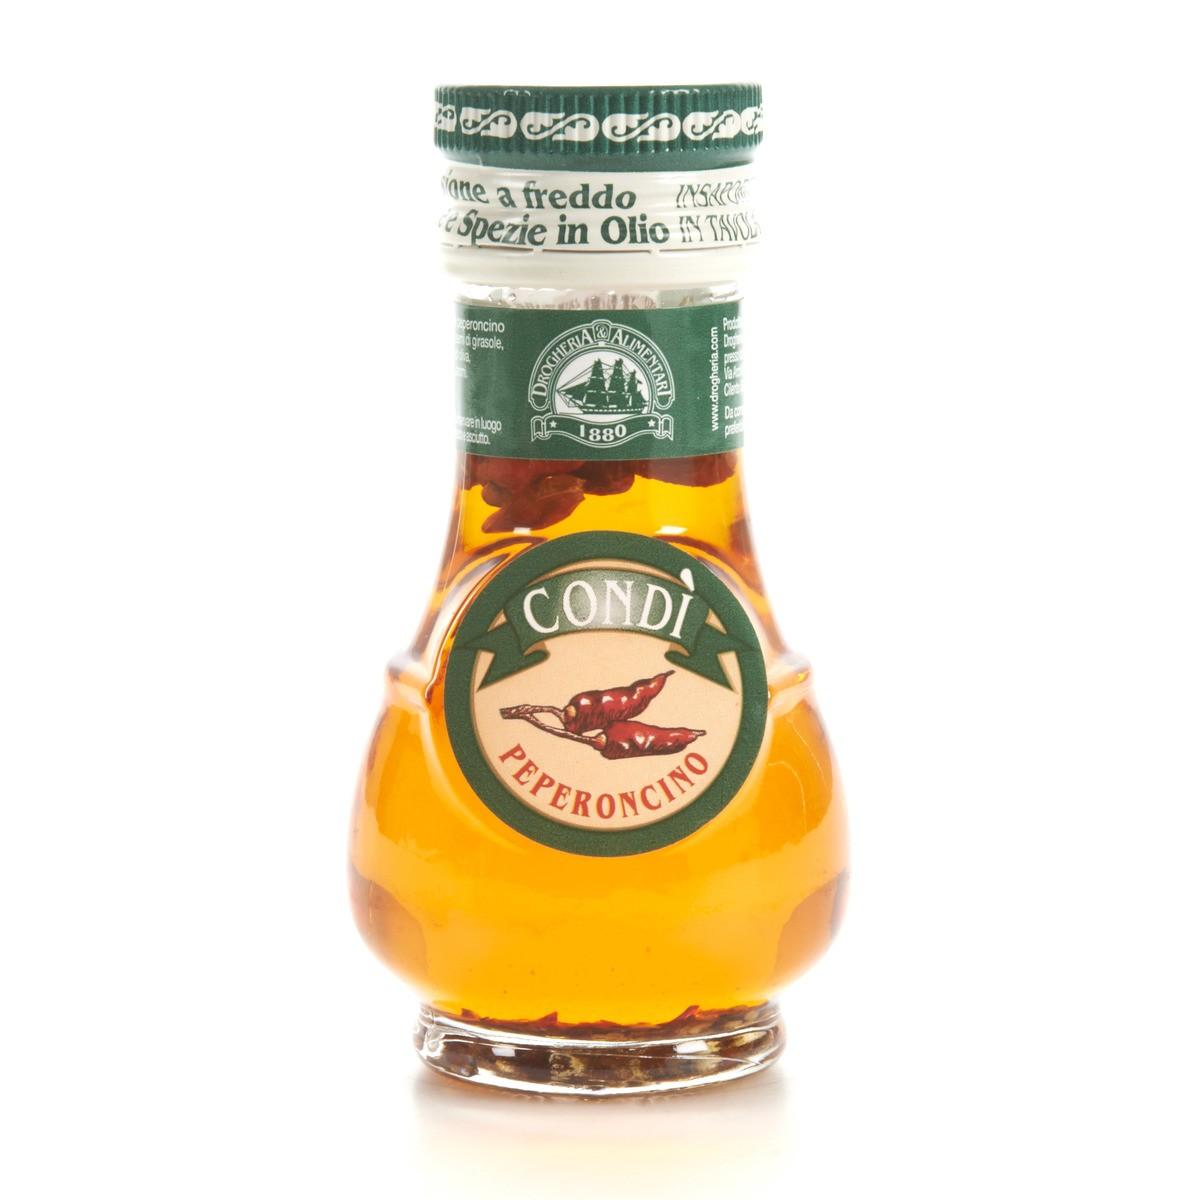 Condì Olio aromatico al peperoncino